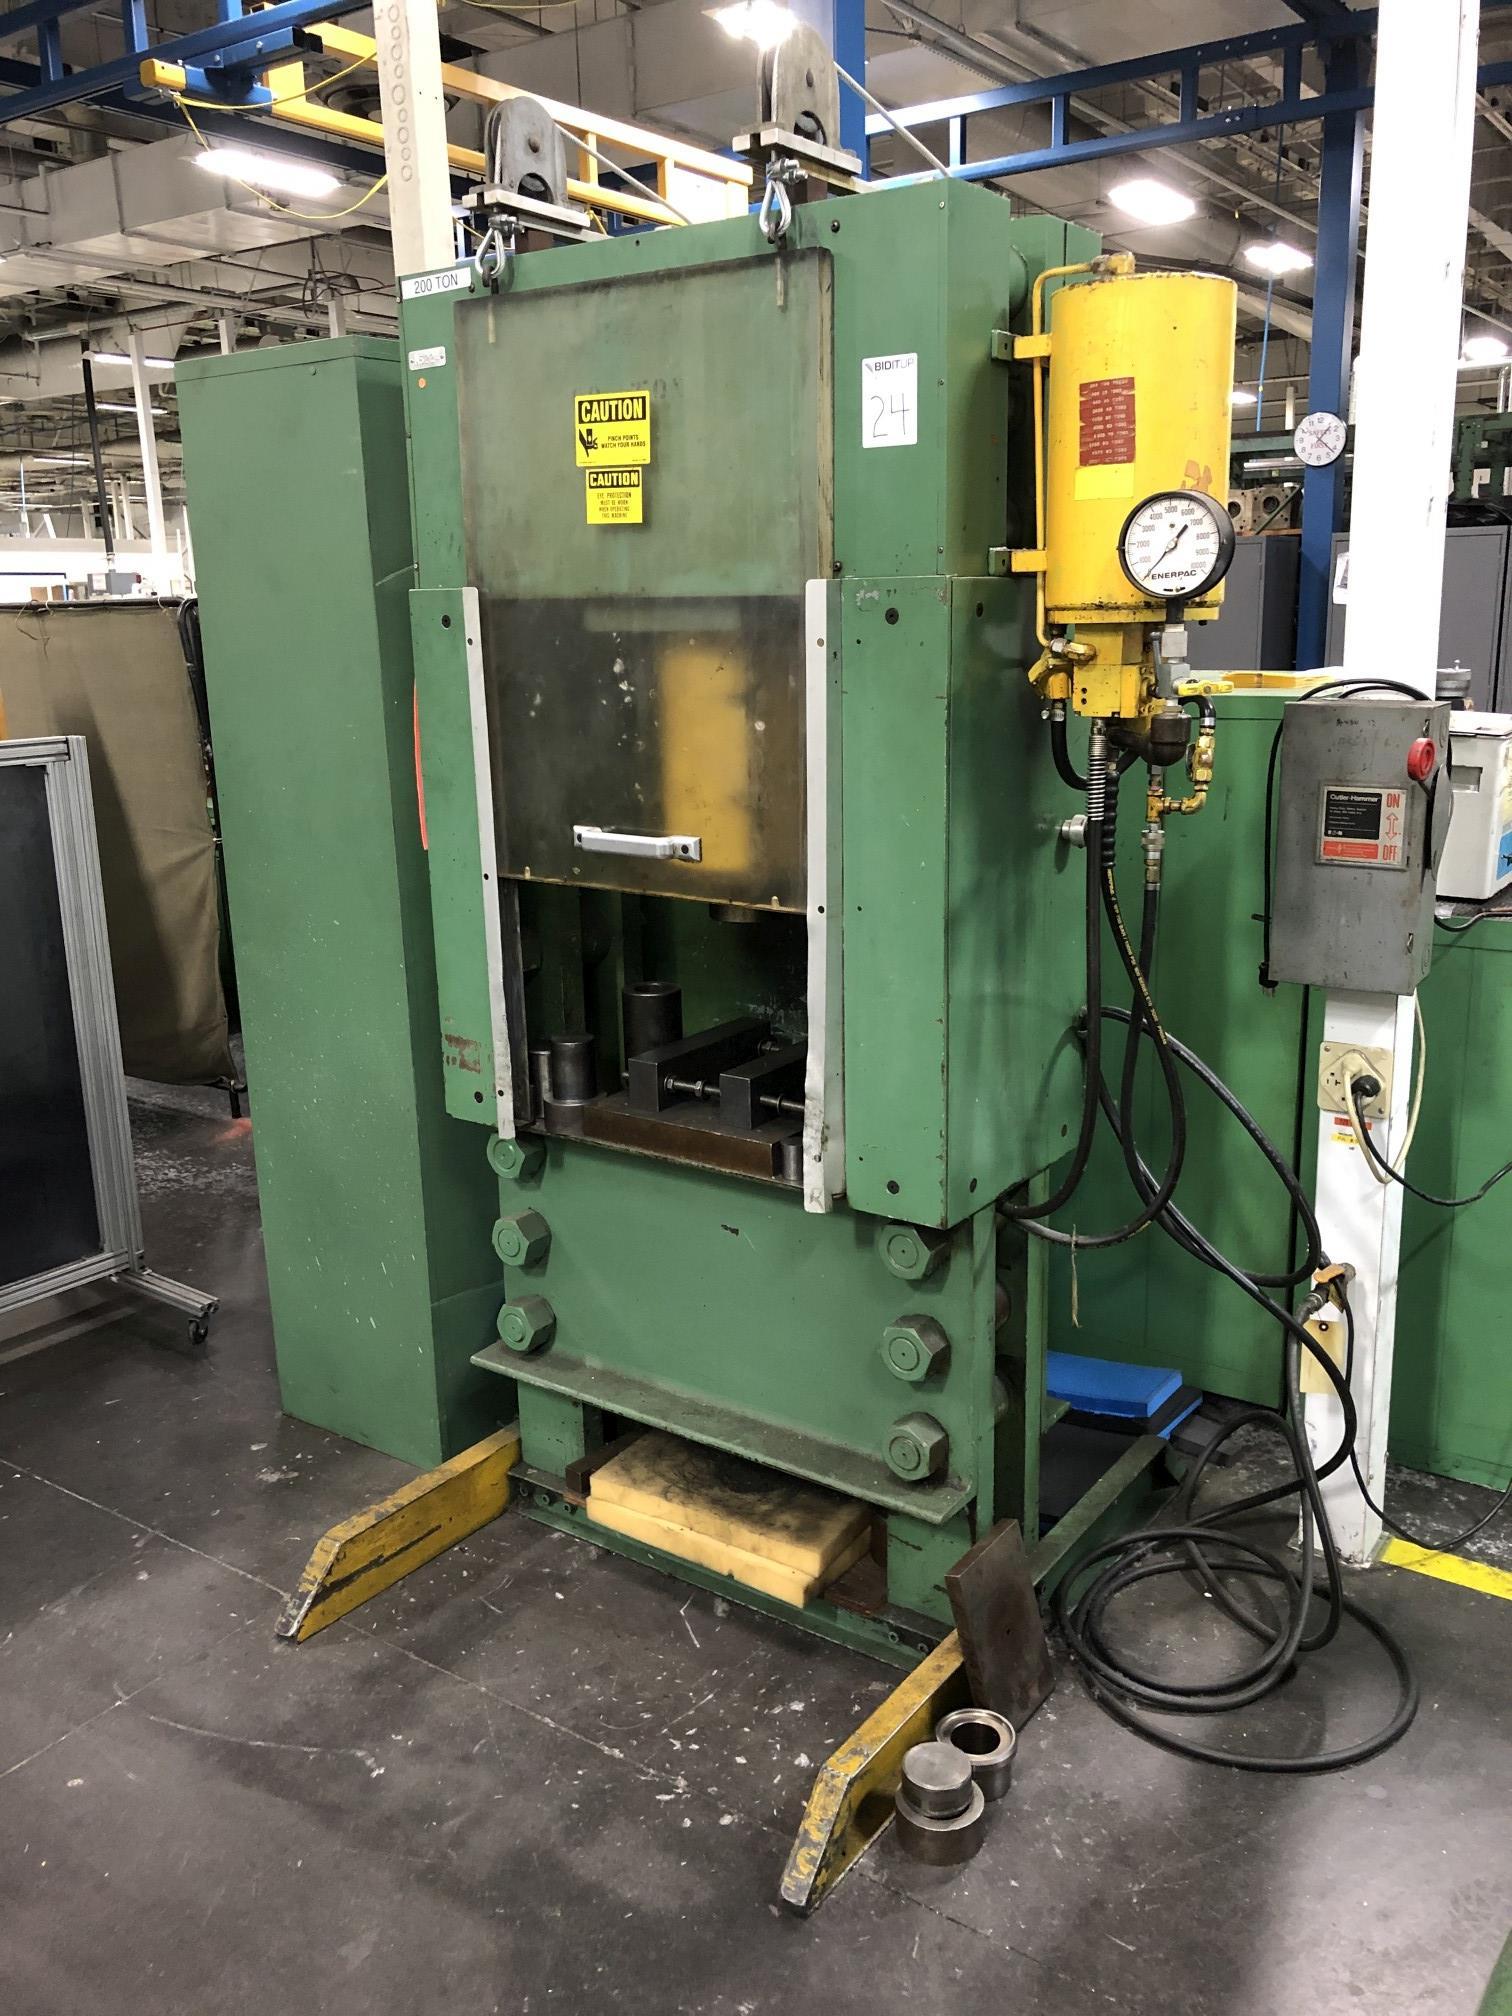 Dake 200 Ton Hydraulic Press - Image 2 of 6